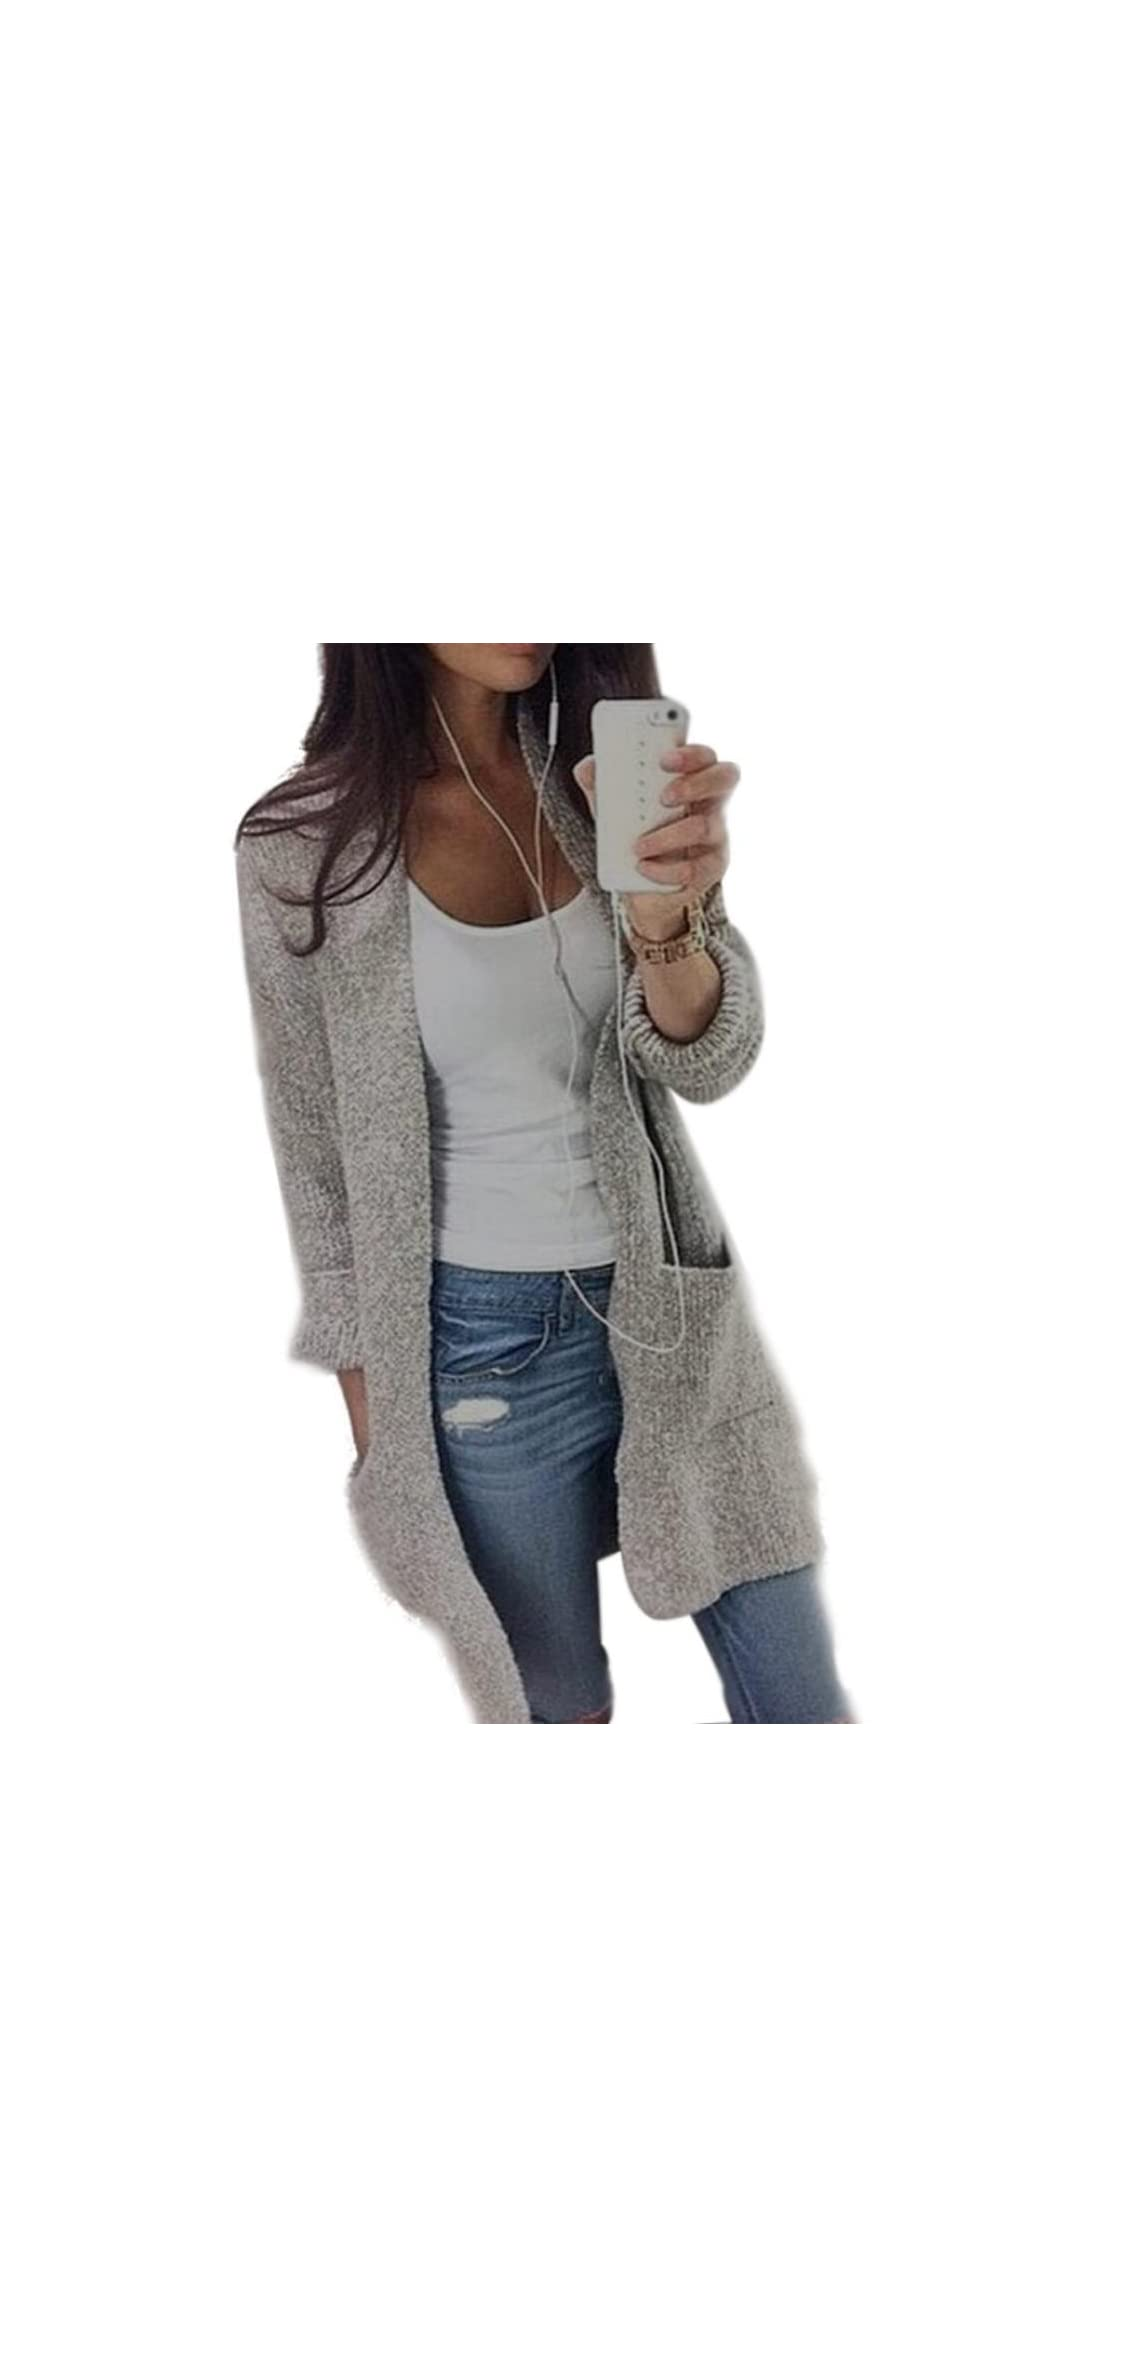 Women Sweaters, Teen Girls Casual Knitted Long Sleeve